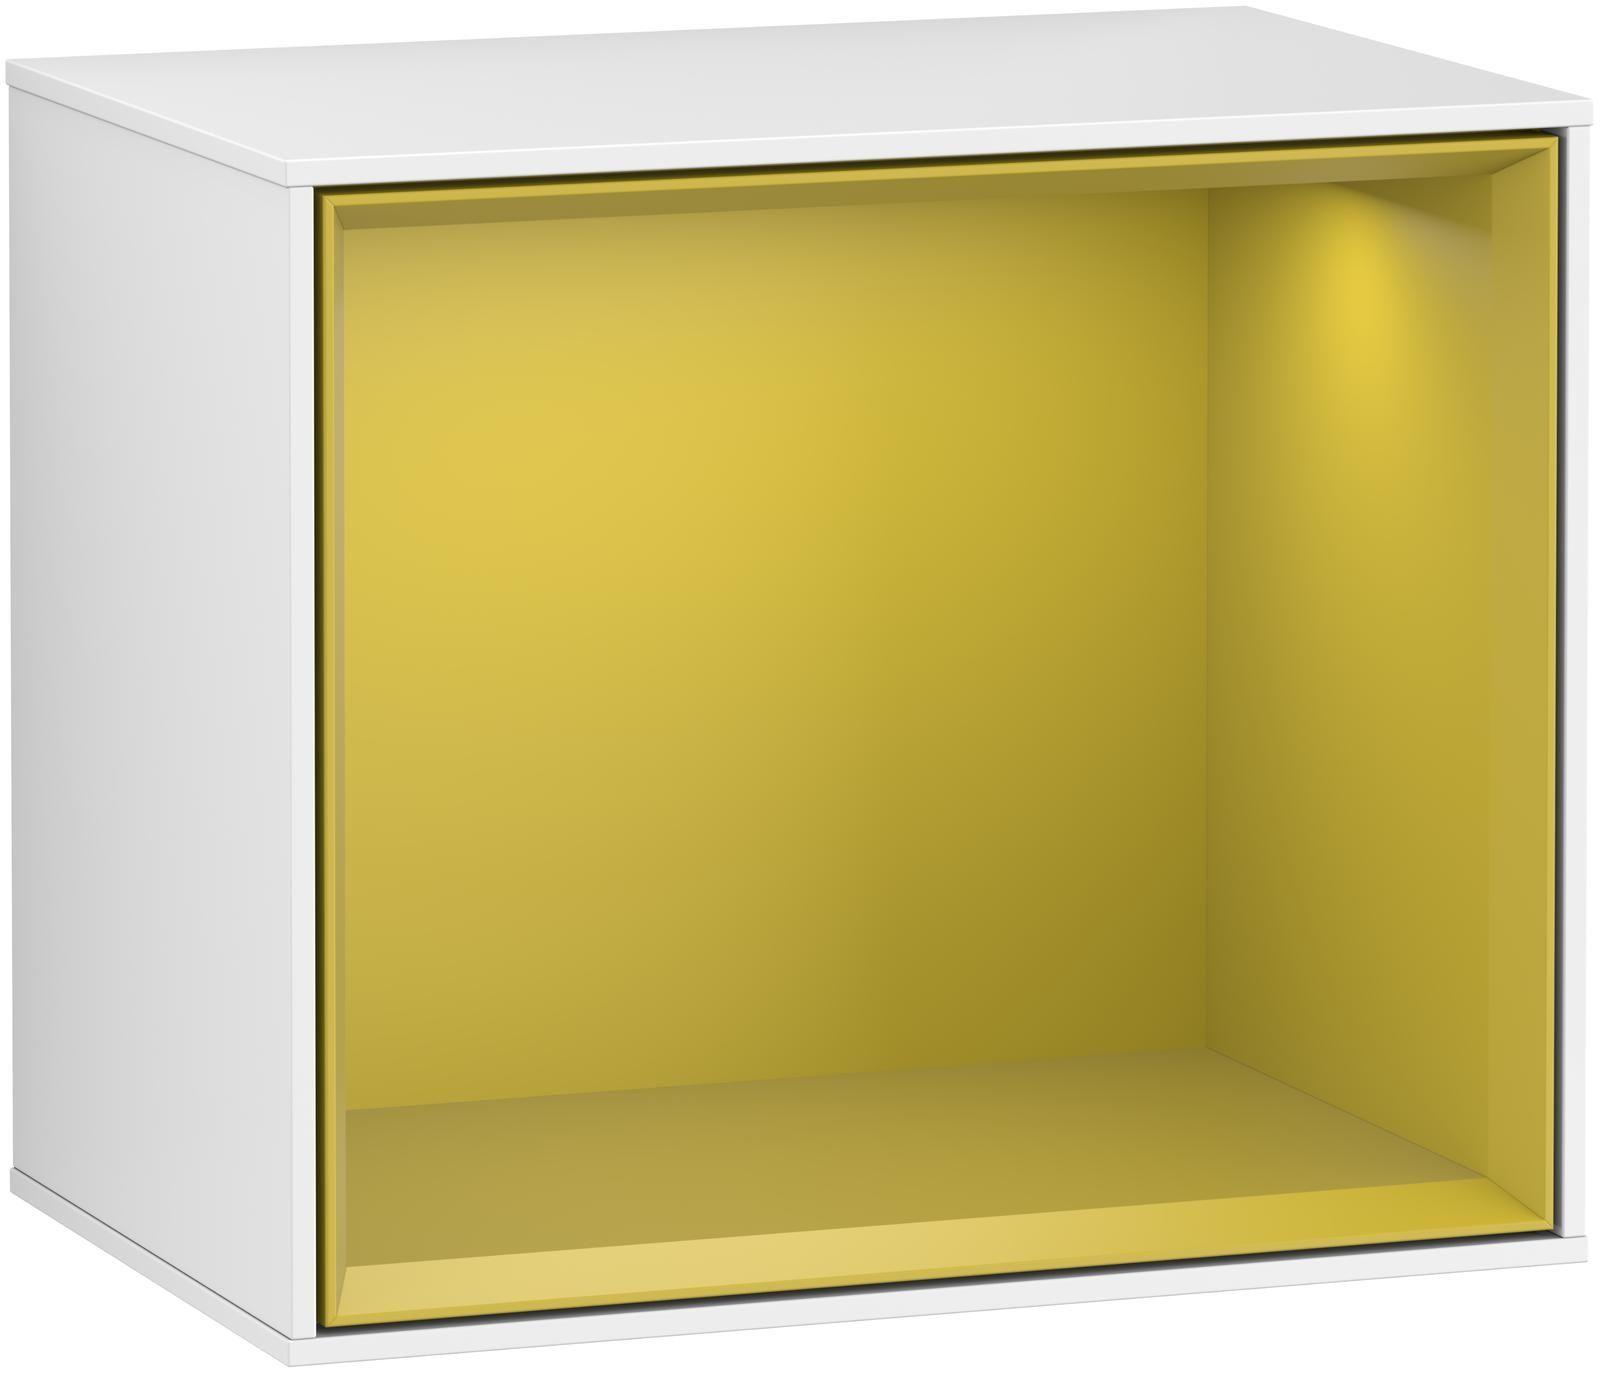 Villeroy & Boch Finion F58 Regalmodul LED-Beleuchtung B:41,8xH:35,6xT:27cm Front, Korpus: Glossy White Lack, Regal: Sun F580HEGF